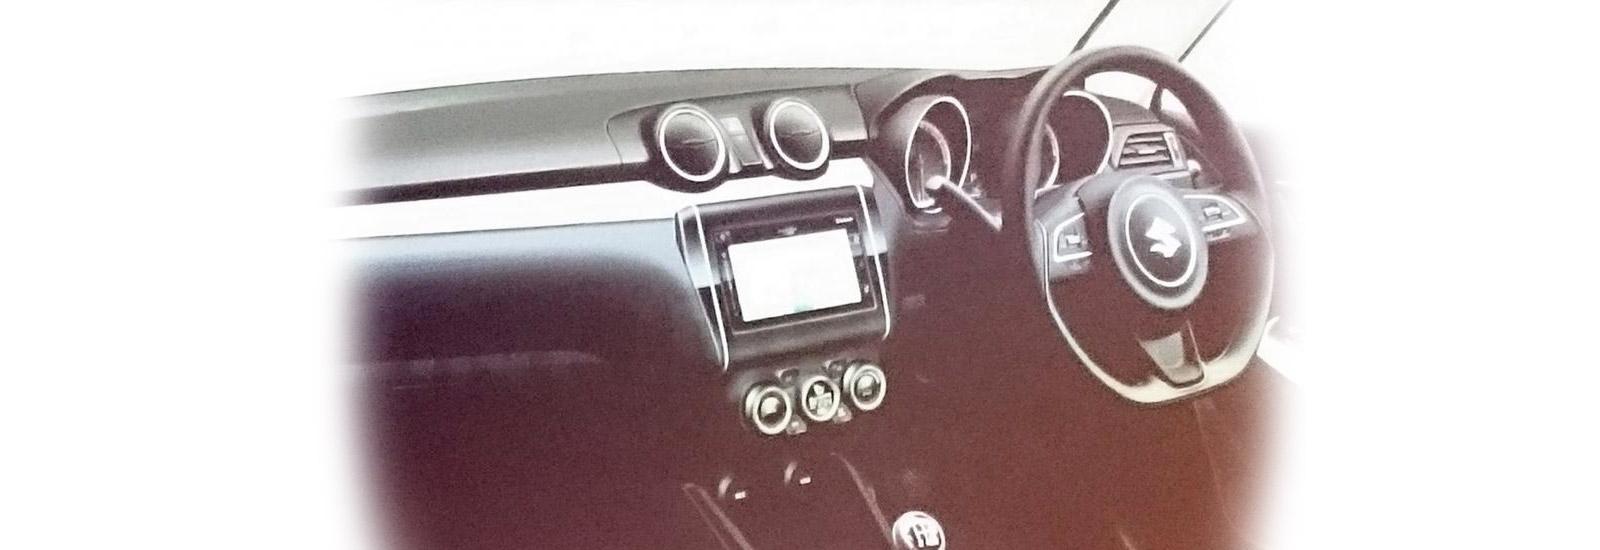 2018 suzuki swift sport interior. wonderful swift the sport will get a racier version of the new swiftu0027s interior shown here on 2018 suzuki swift sport interior